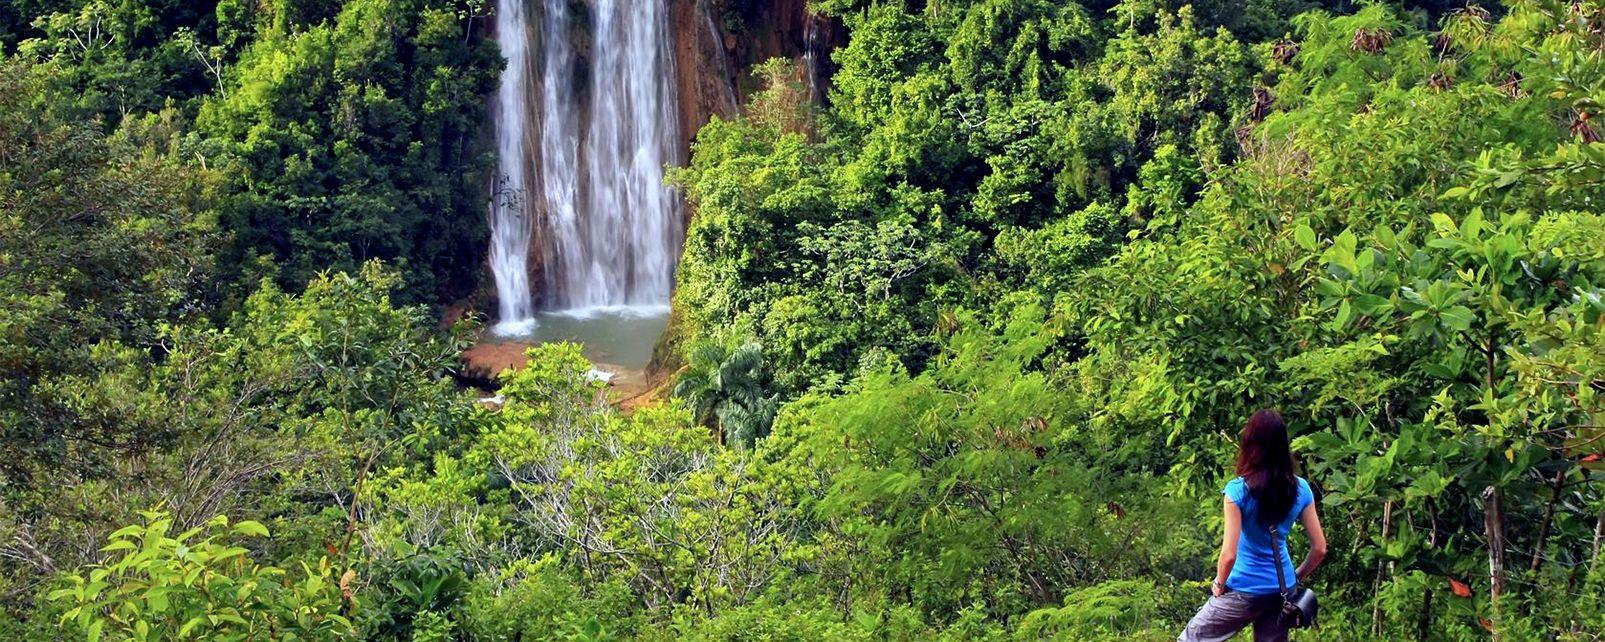 El Limon Waterfall, Salto de Limon (waterfall), Landscapes, Dominican Republic